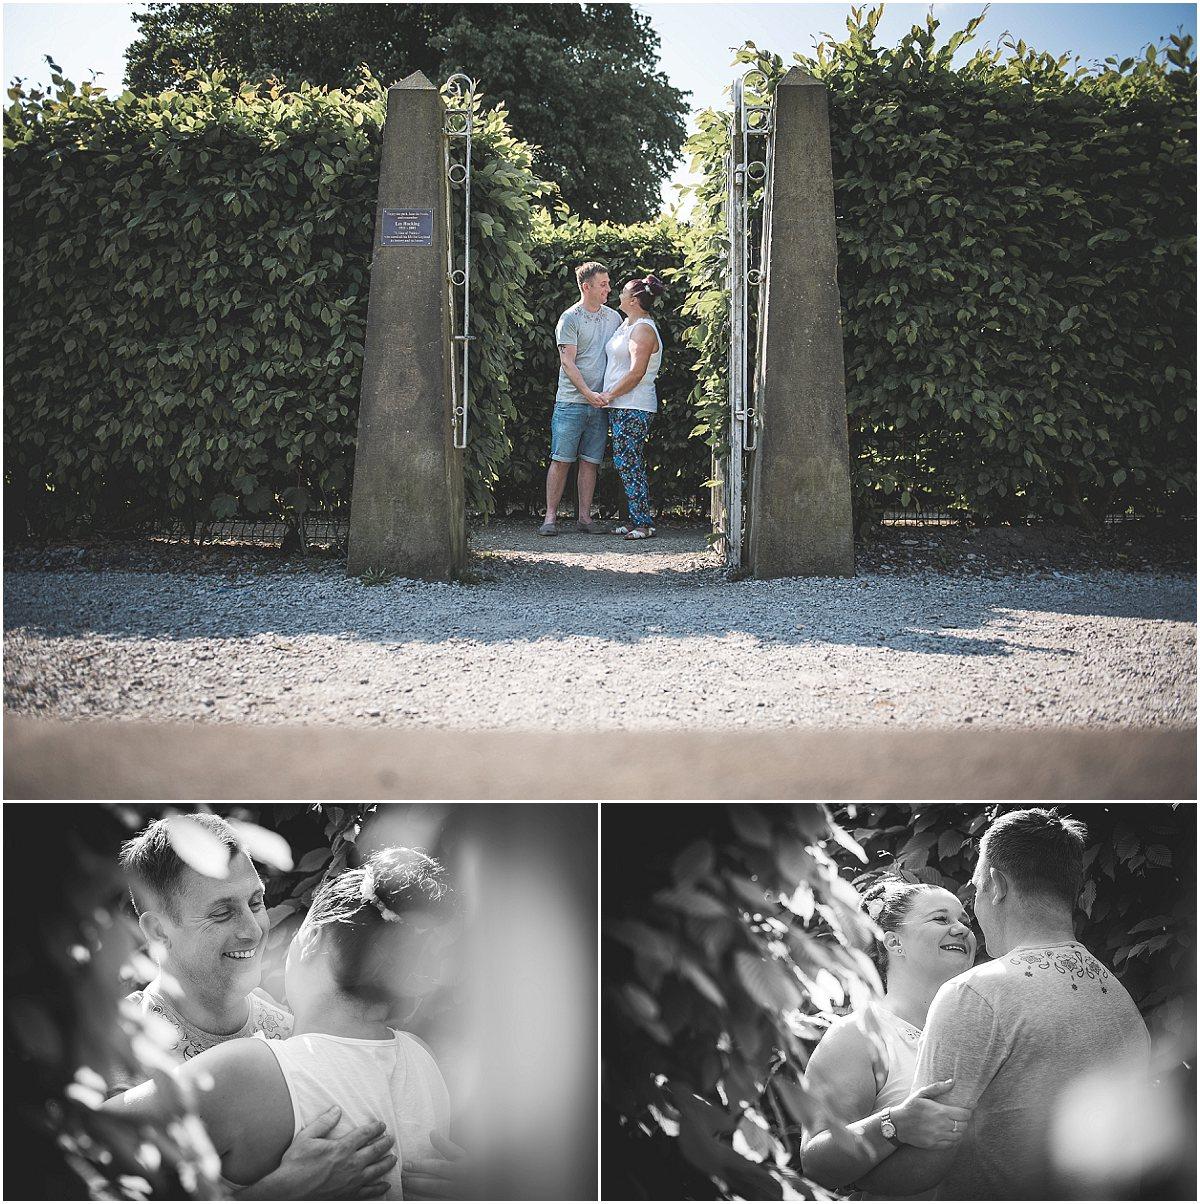 Worden Park Maze - Couples Shoot